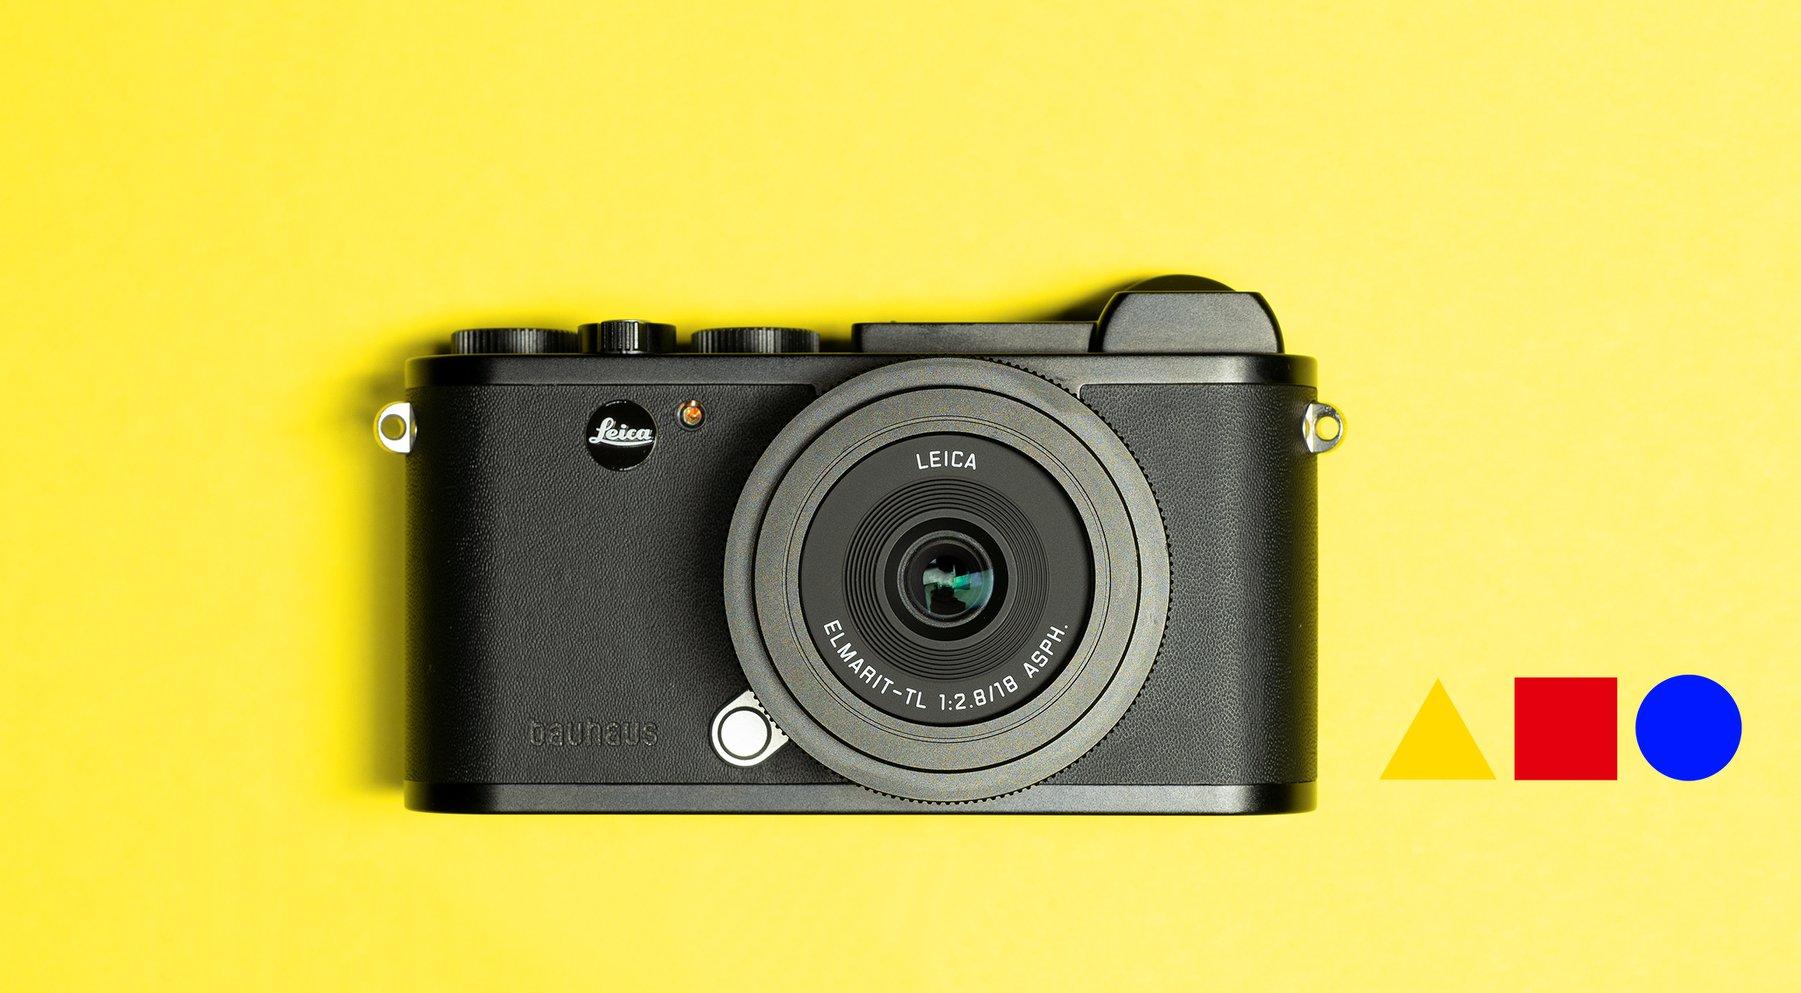 "Leica CL ""100 Jahre Bauhaus - Bauhaus Museum Dessau"" edition camera is now officially announced - Leica Rumors"